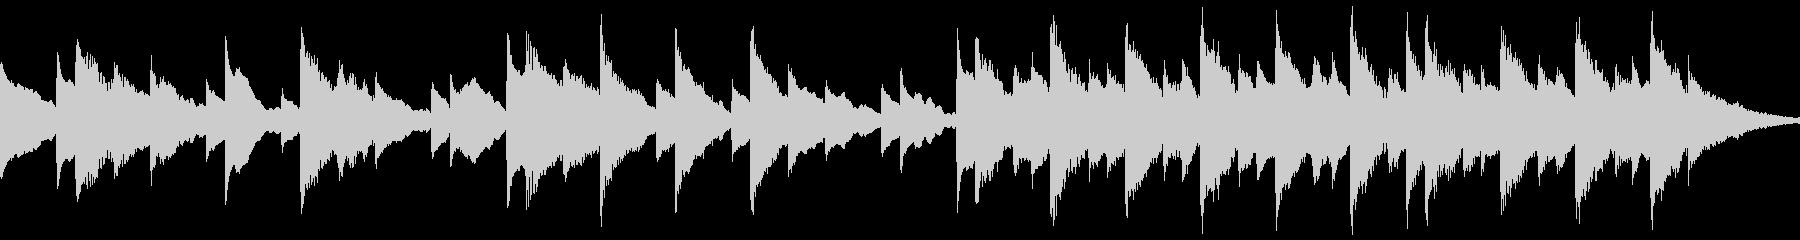 Happy birthday music box's unreproduced waveform